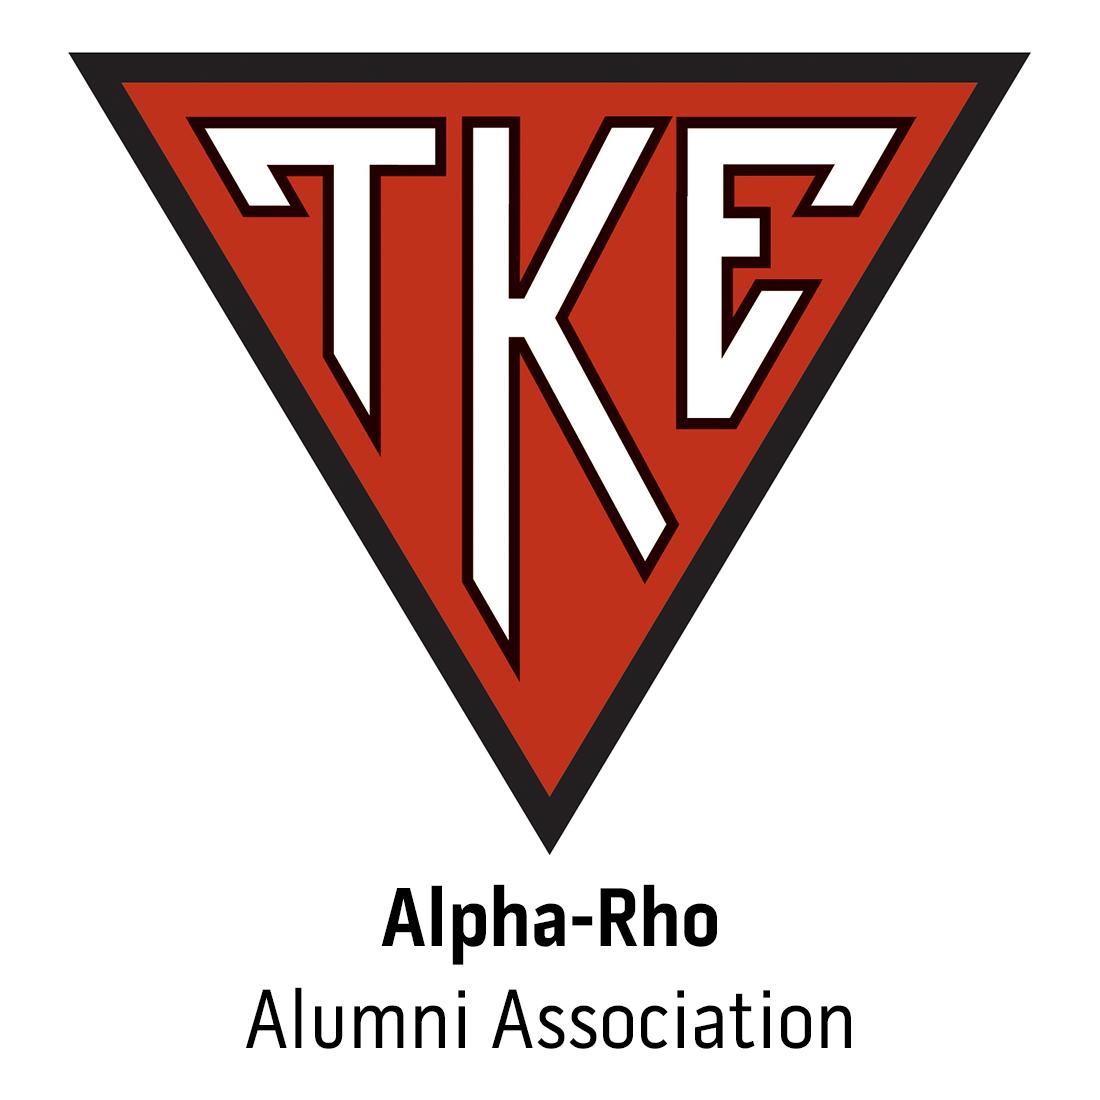 Alpha-Rho Alumni Association for University of Rhode Island